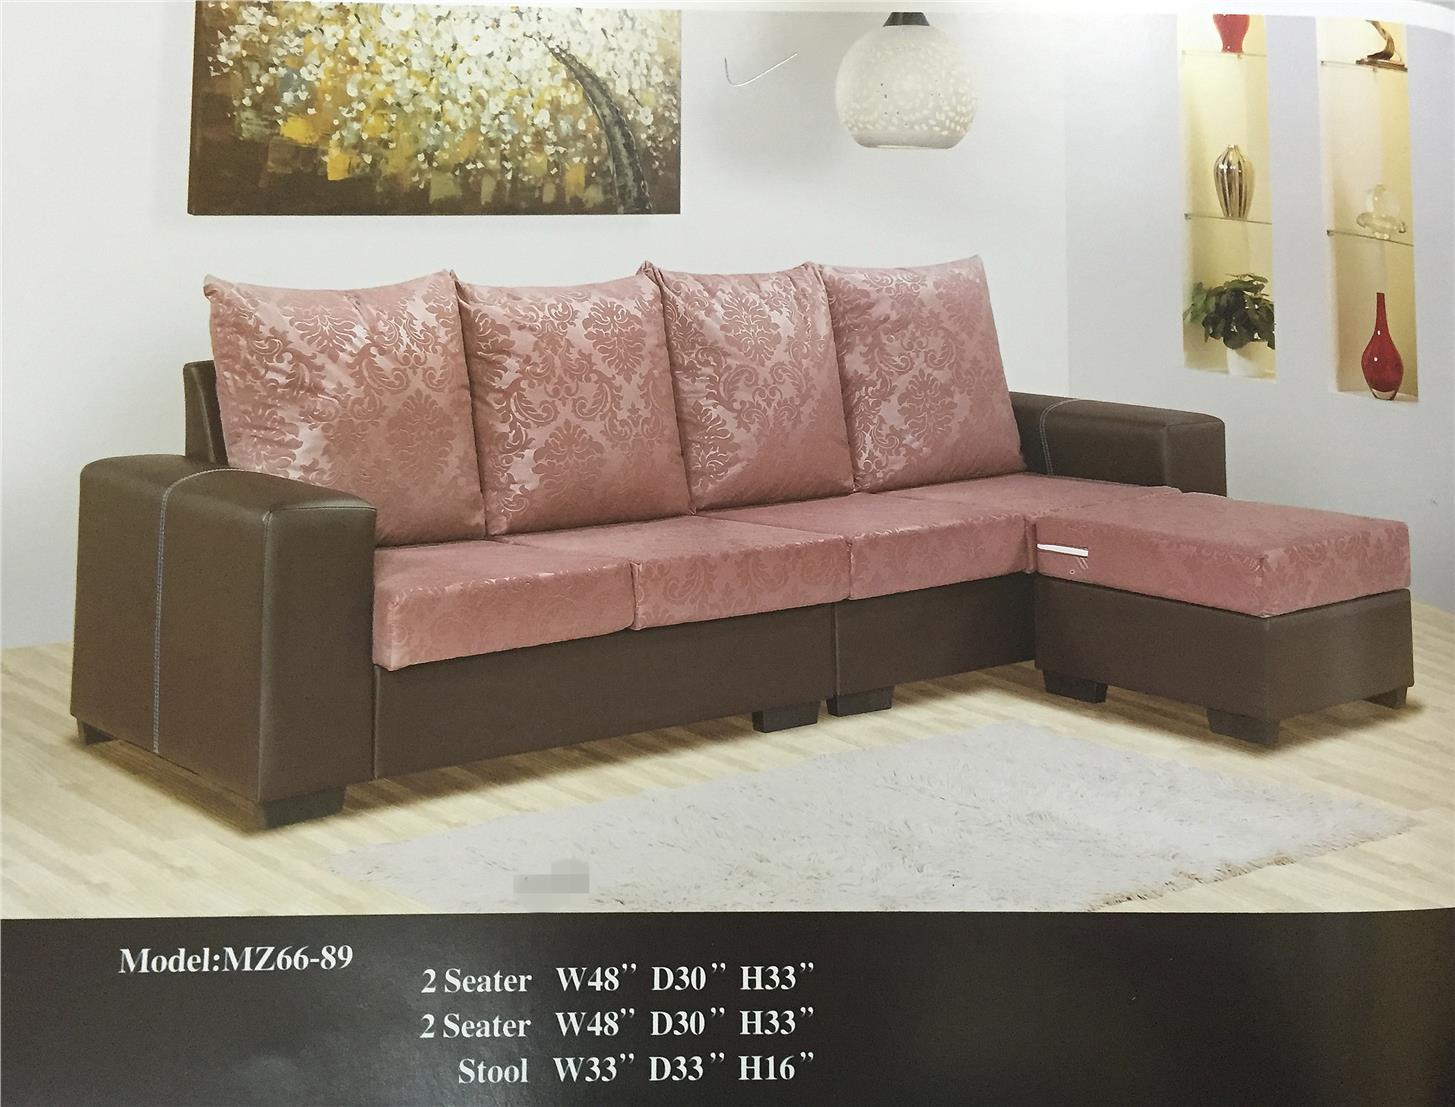 sofa bed murah malaysia 2018 rv with footrest ansuran bulanan l shape mo end 4 8 6 15 pm